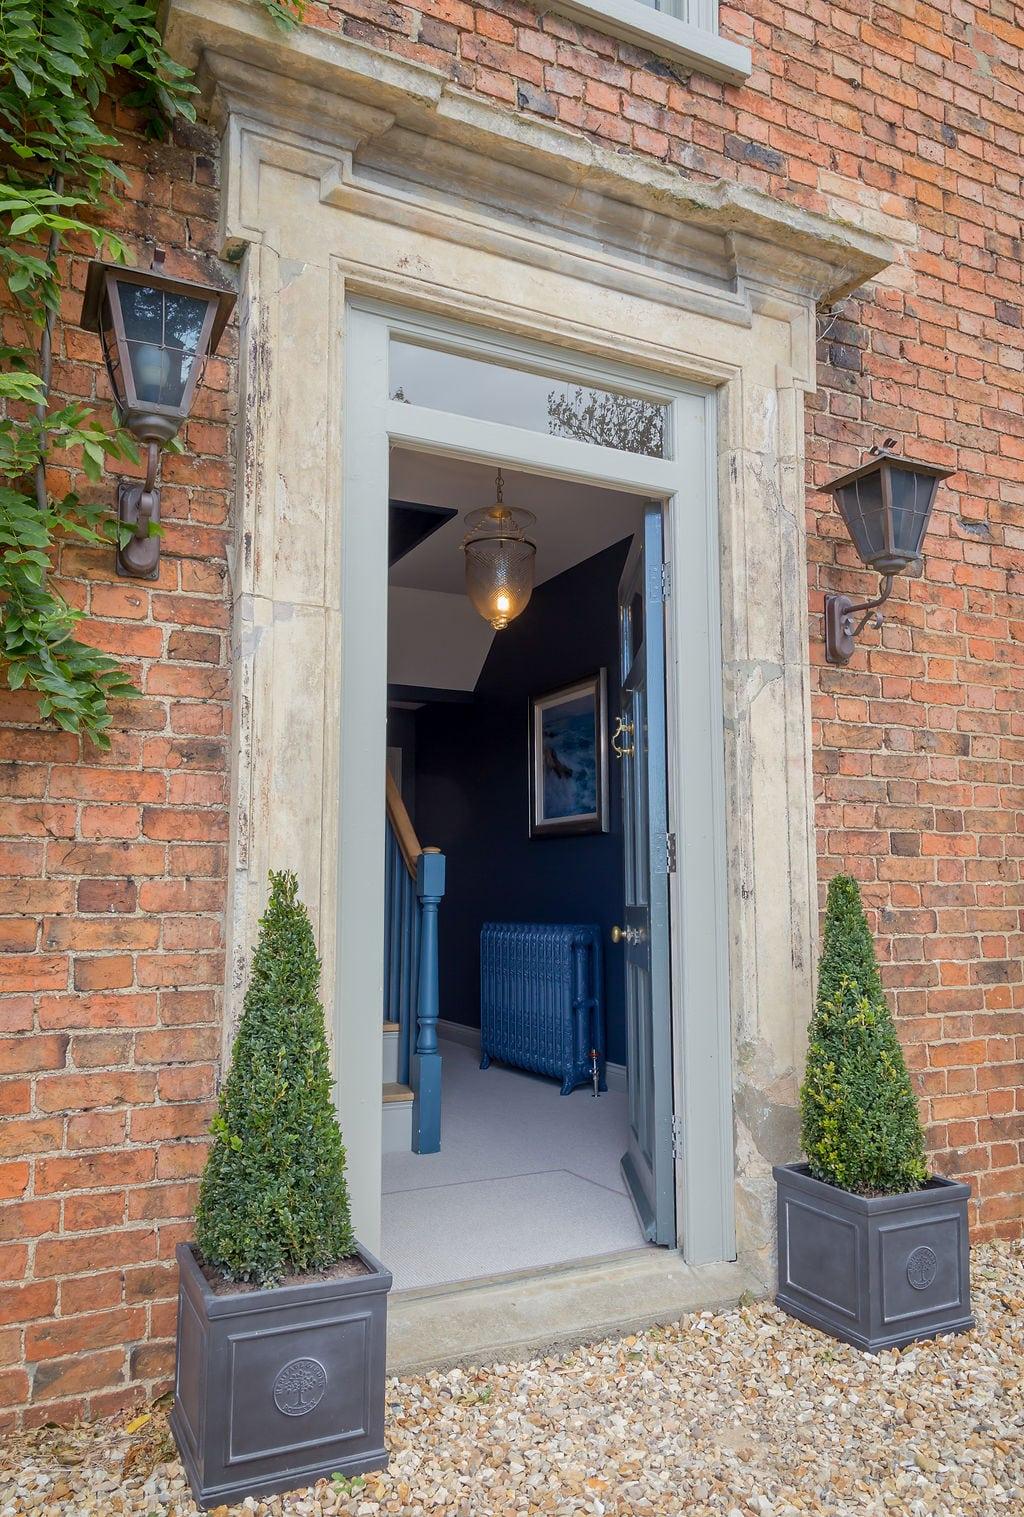 Old Blue Cast IronRadiatorThrough Doorway